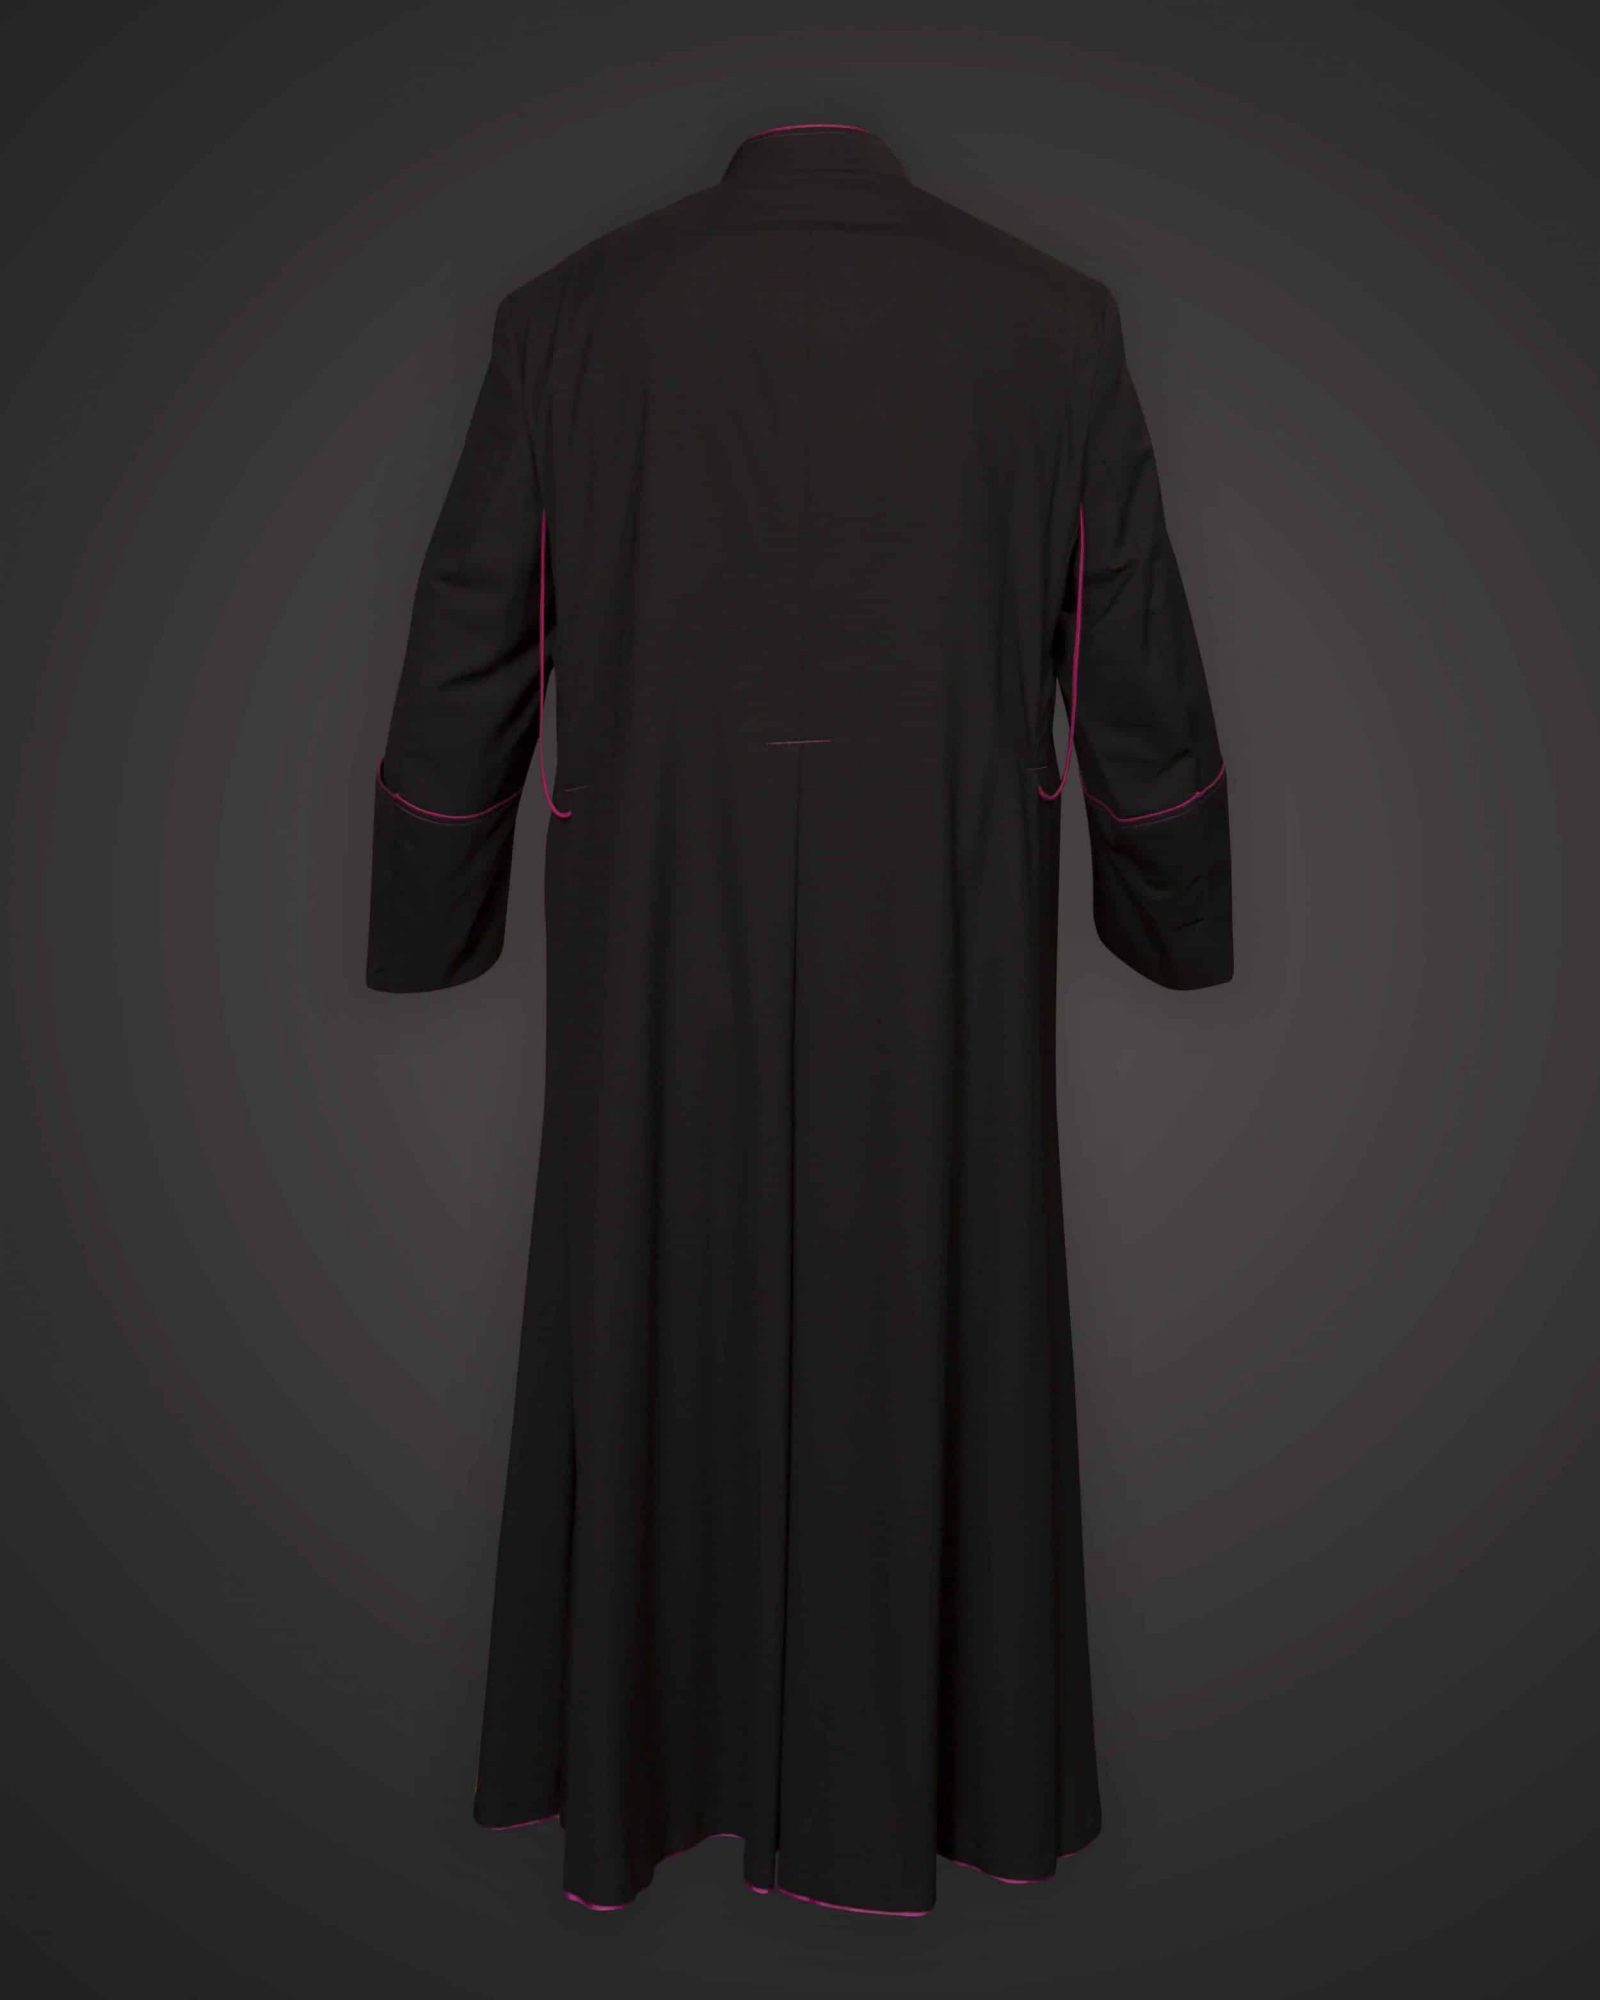 Black Cassock Purple Trim (Msgr Chaplain) - Satin Wool